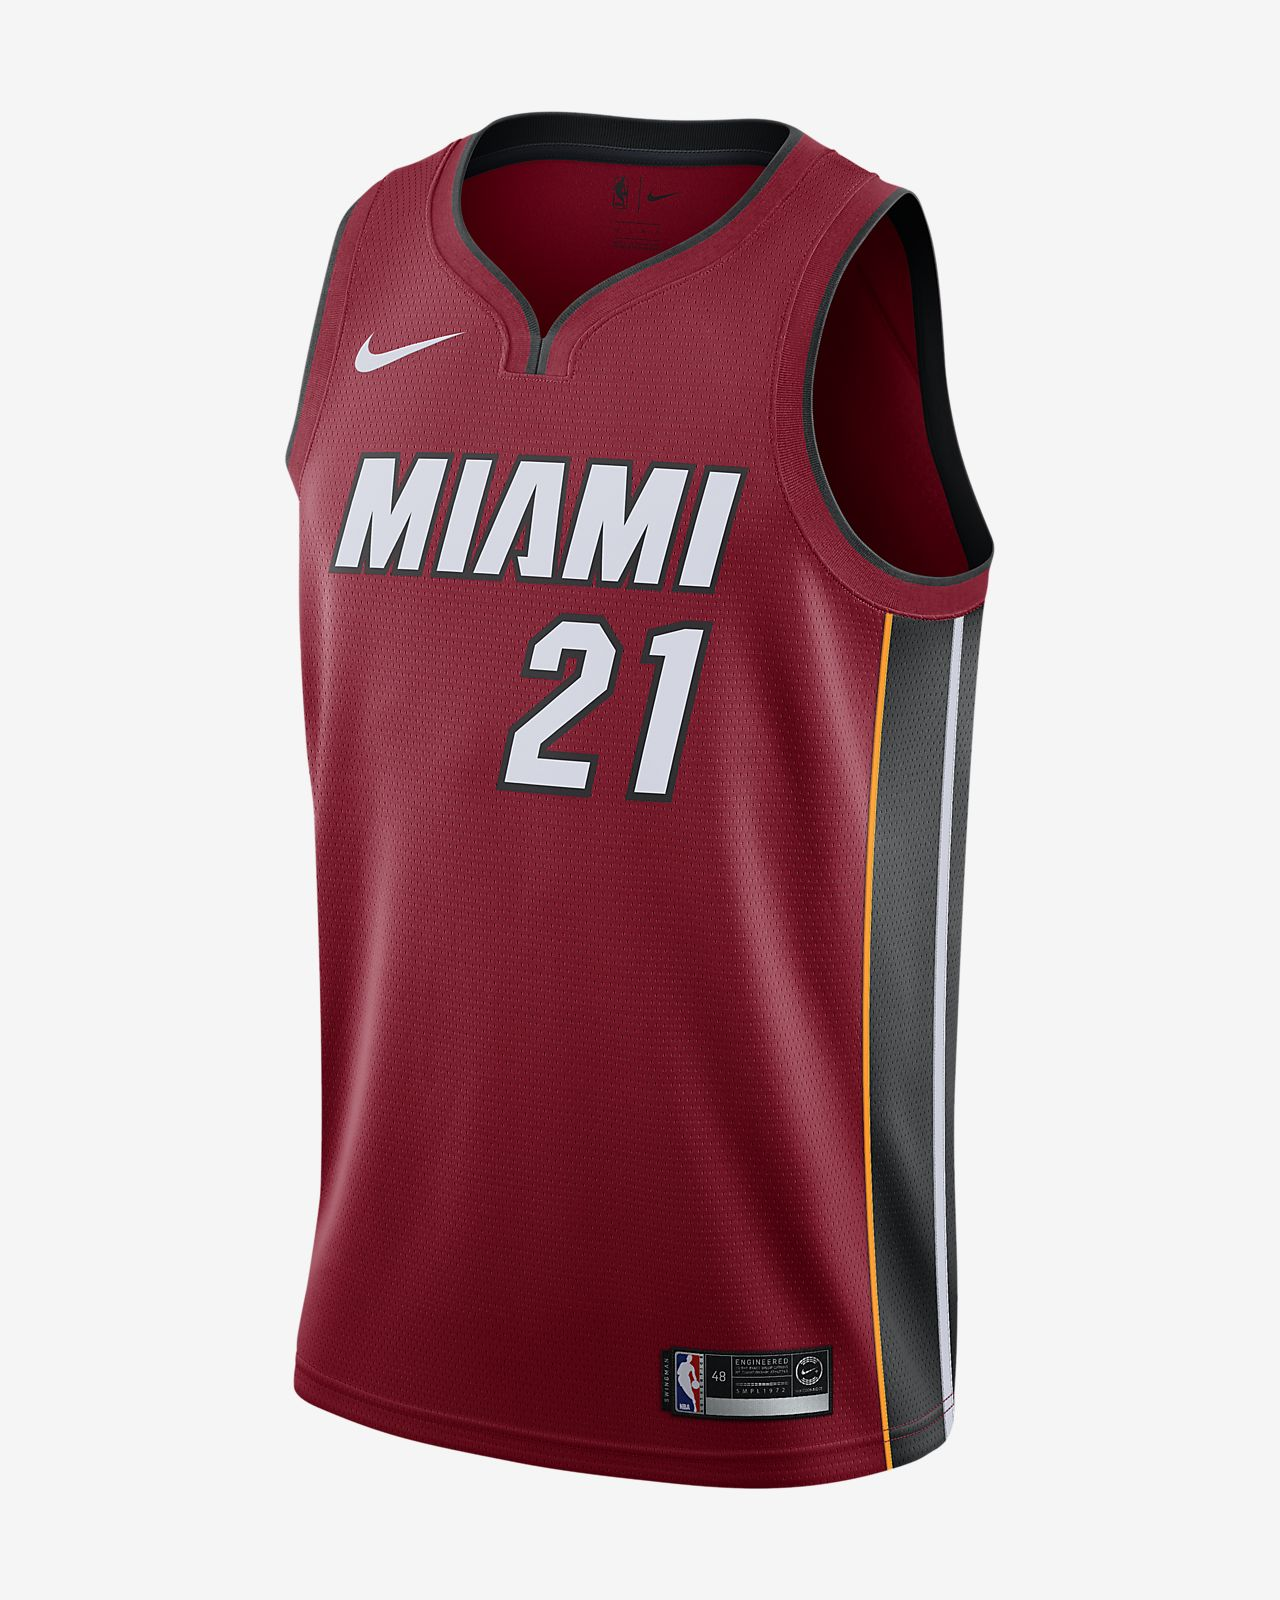 81f3078ea55 Men s Nike NBA Connected Jersey. Hassan Whiteside Statement Edition  Swingman (Miami Heat)